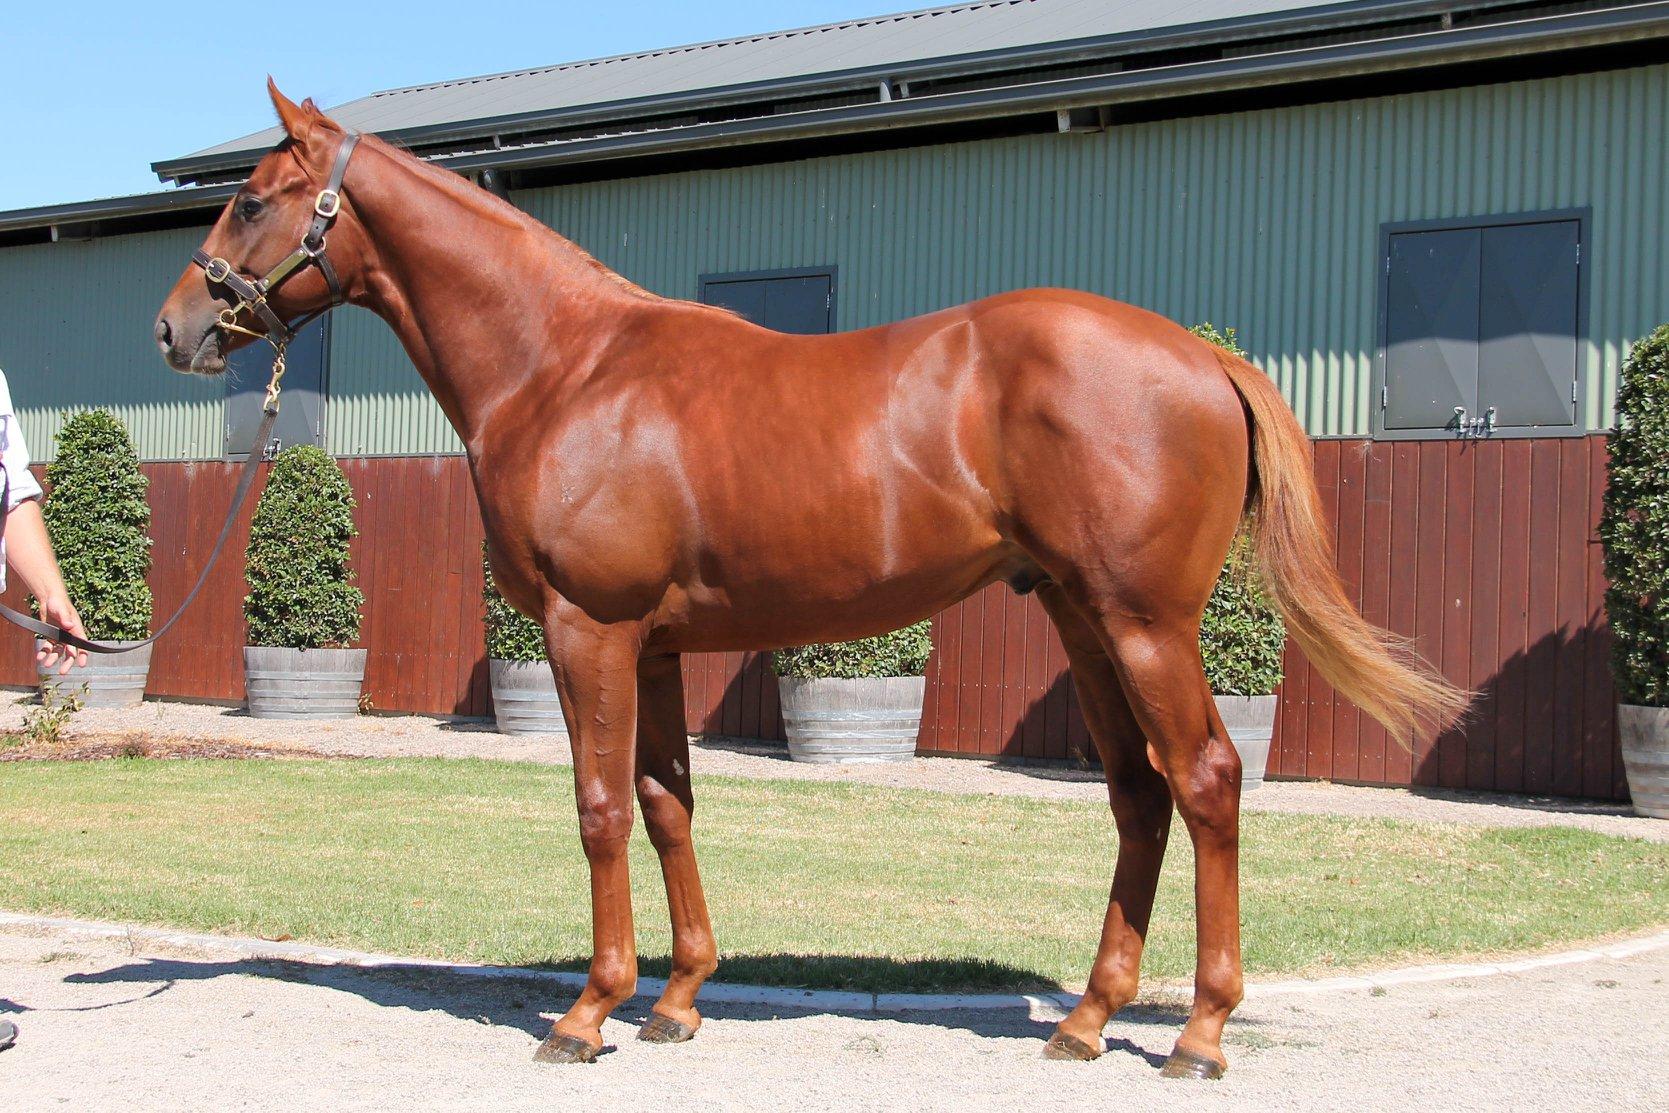 LOT 414  SIRE: Toronado  DAM: Happy Empress  Chestnut Colt  PURCHASER: Craig Carmody Racing Stables NSW  PRICE: $150,000.00